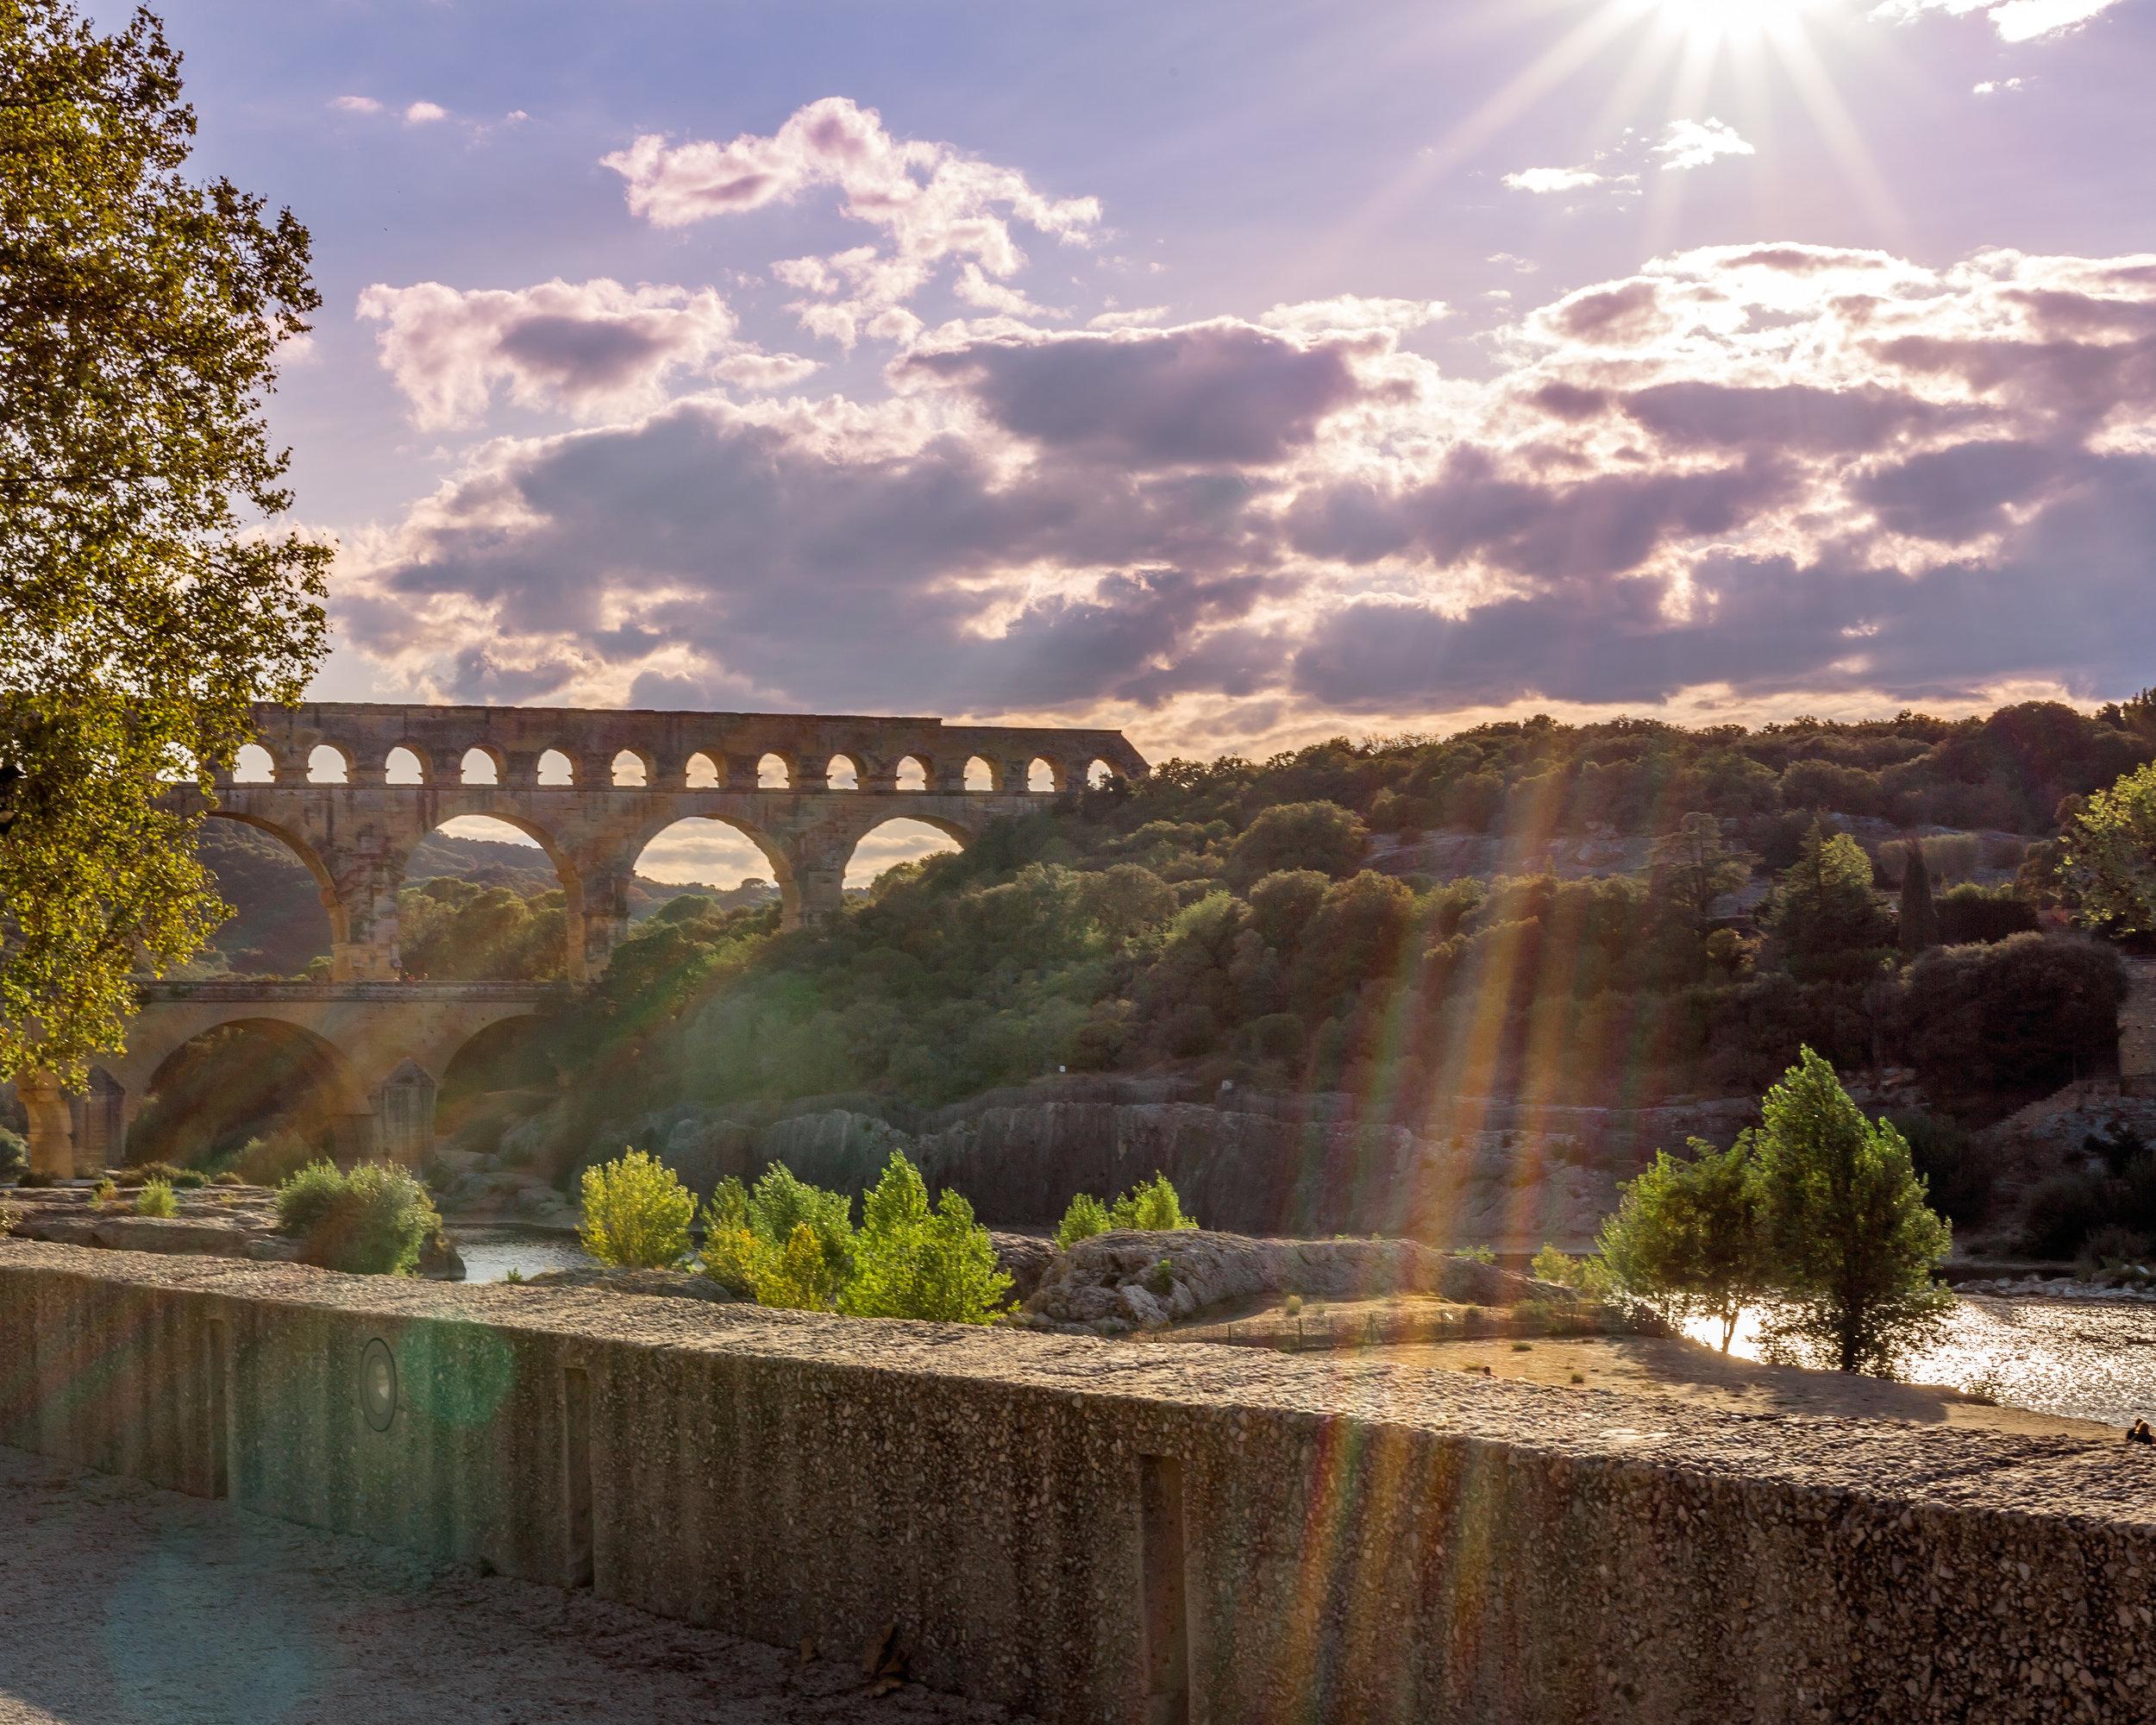 Magical Pont Du Guard!